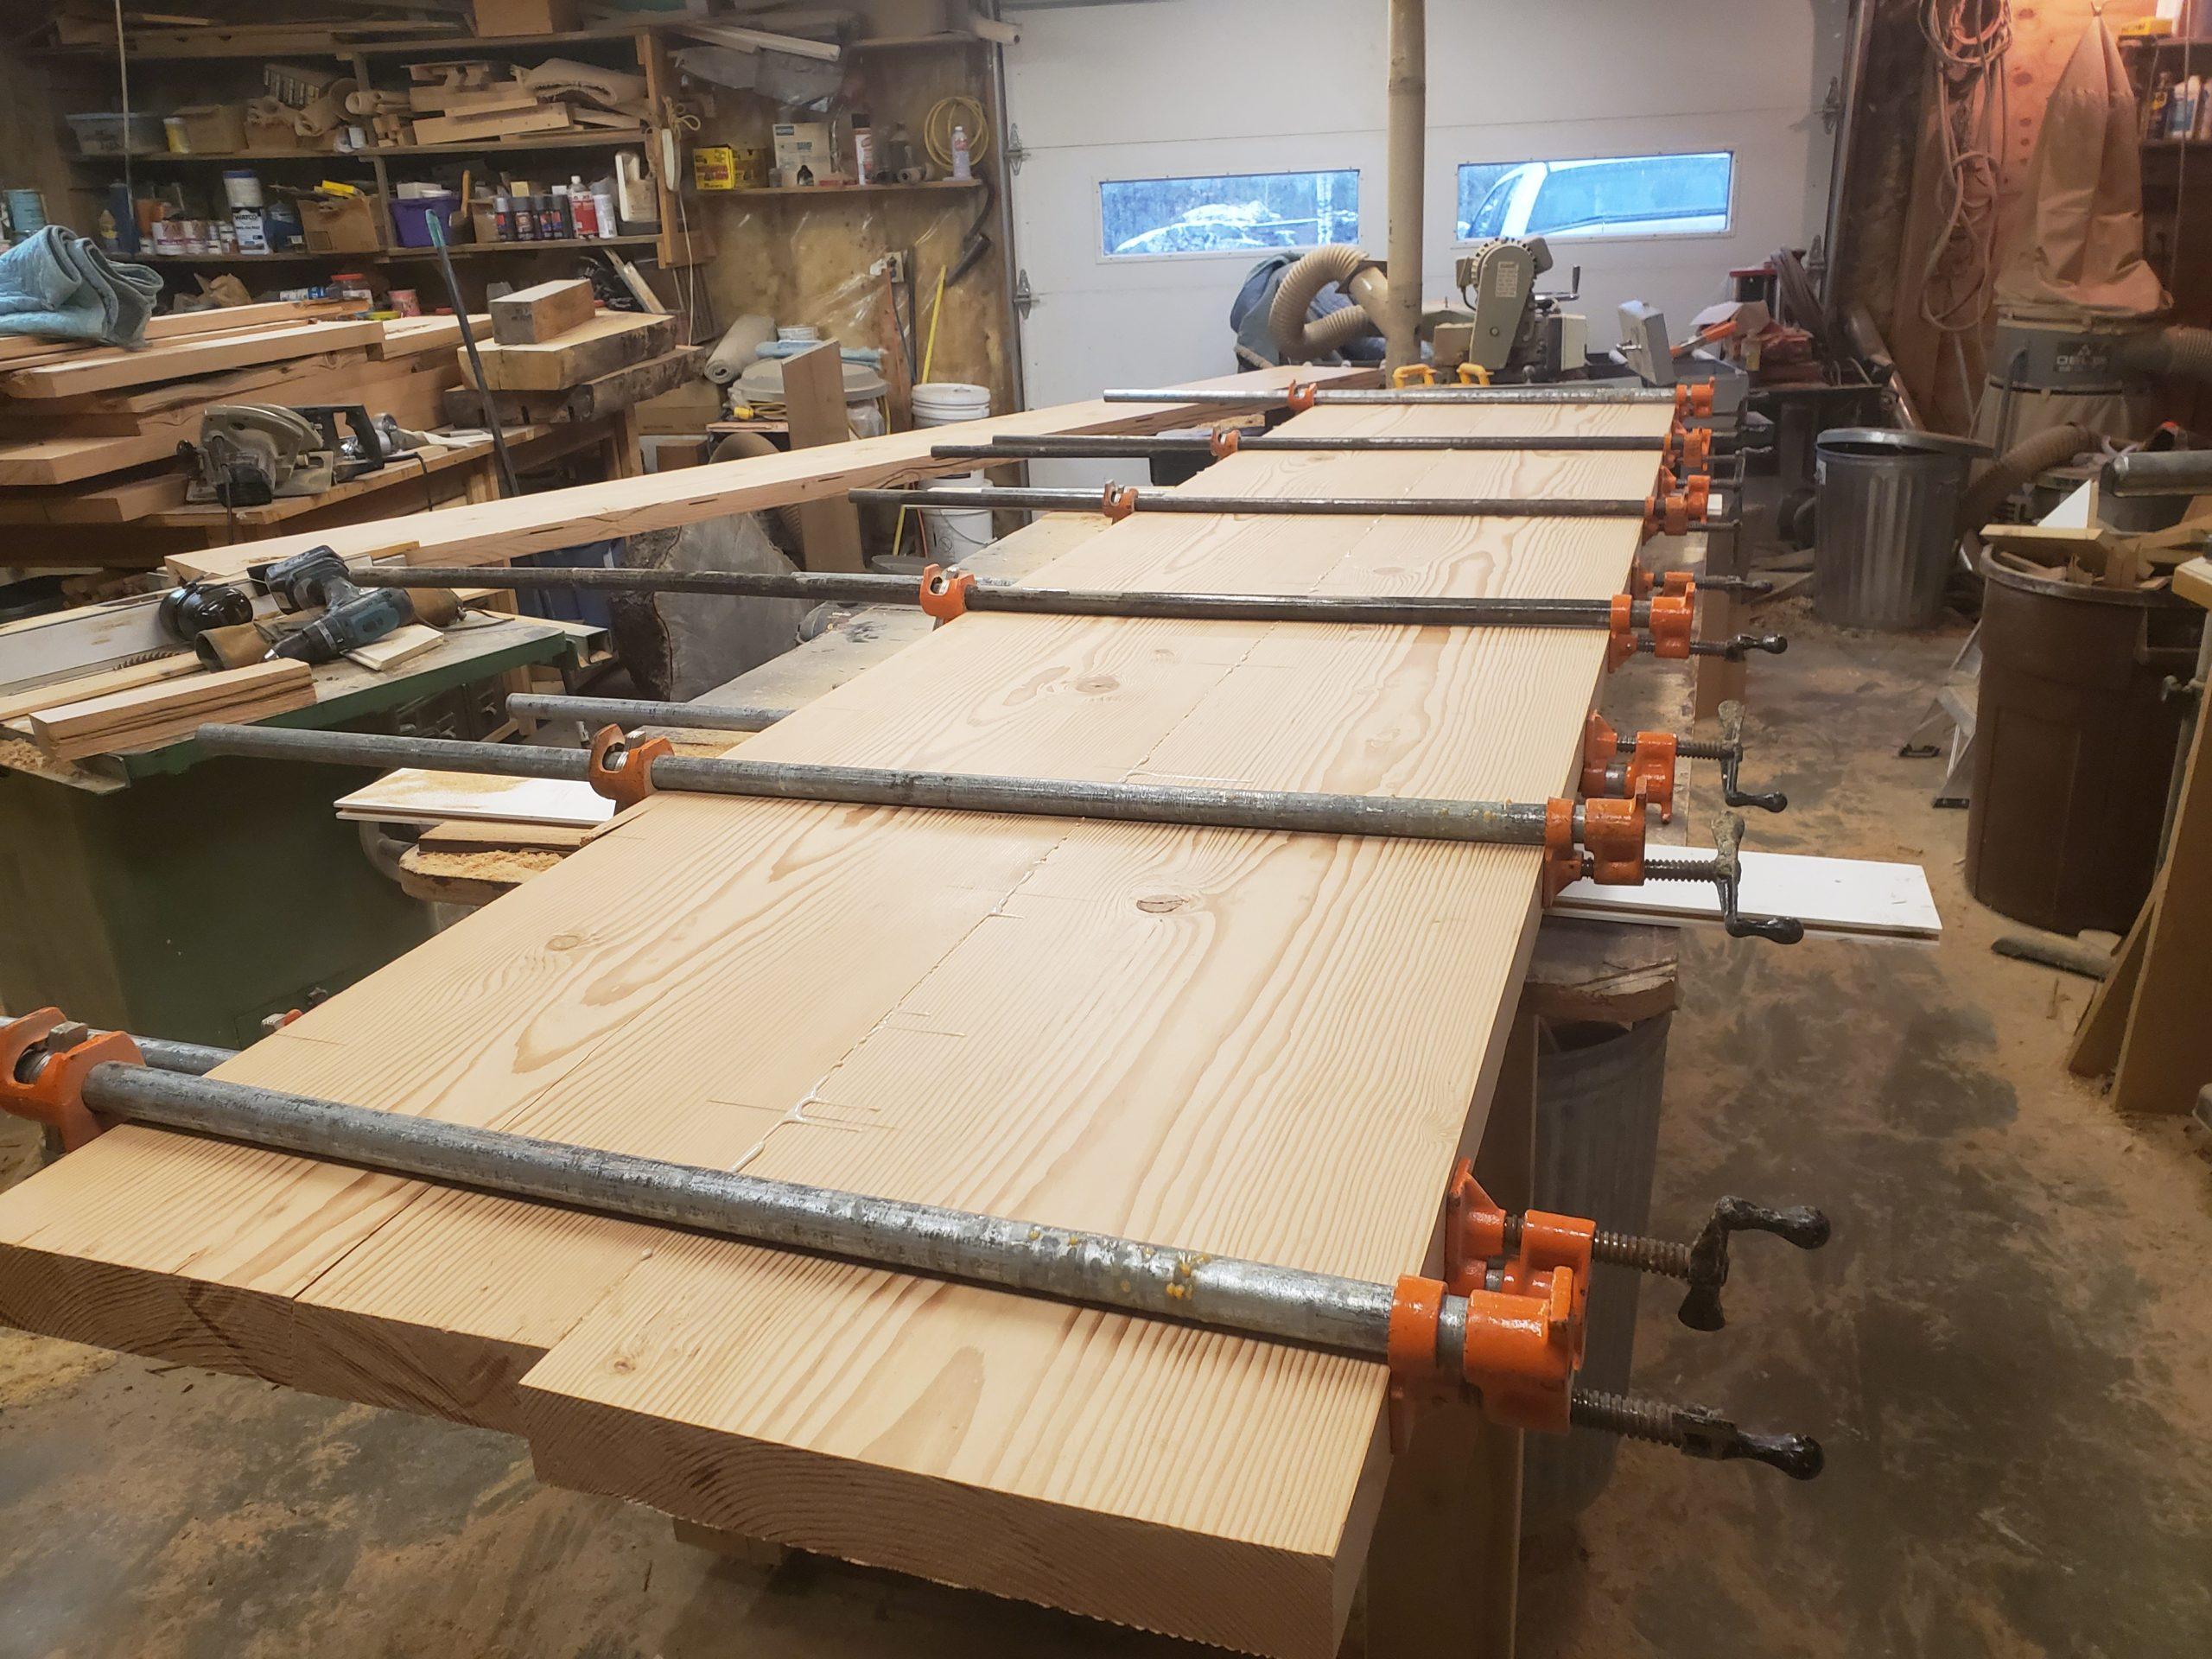 Gluing slabs of Douglas Fir for custom table by John Huisman